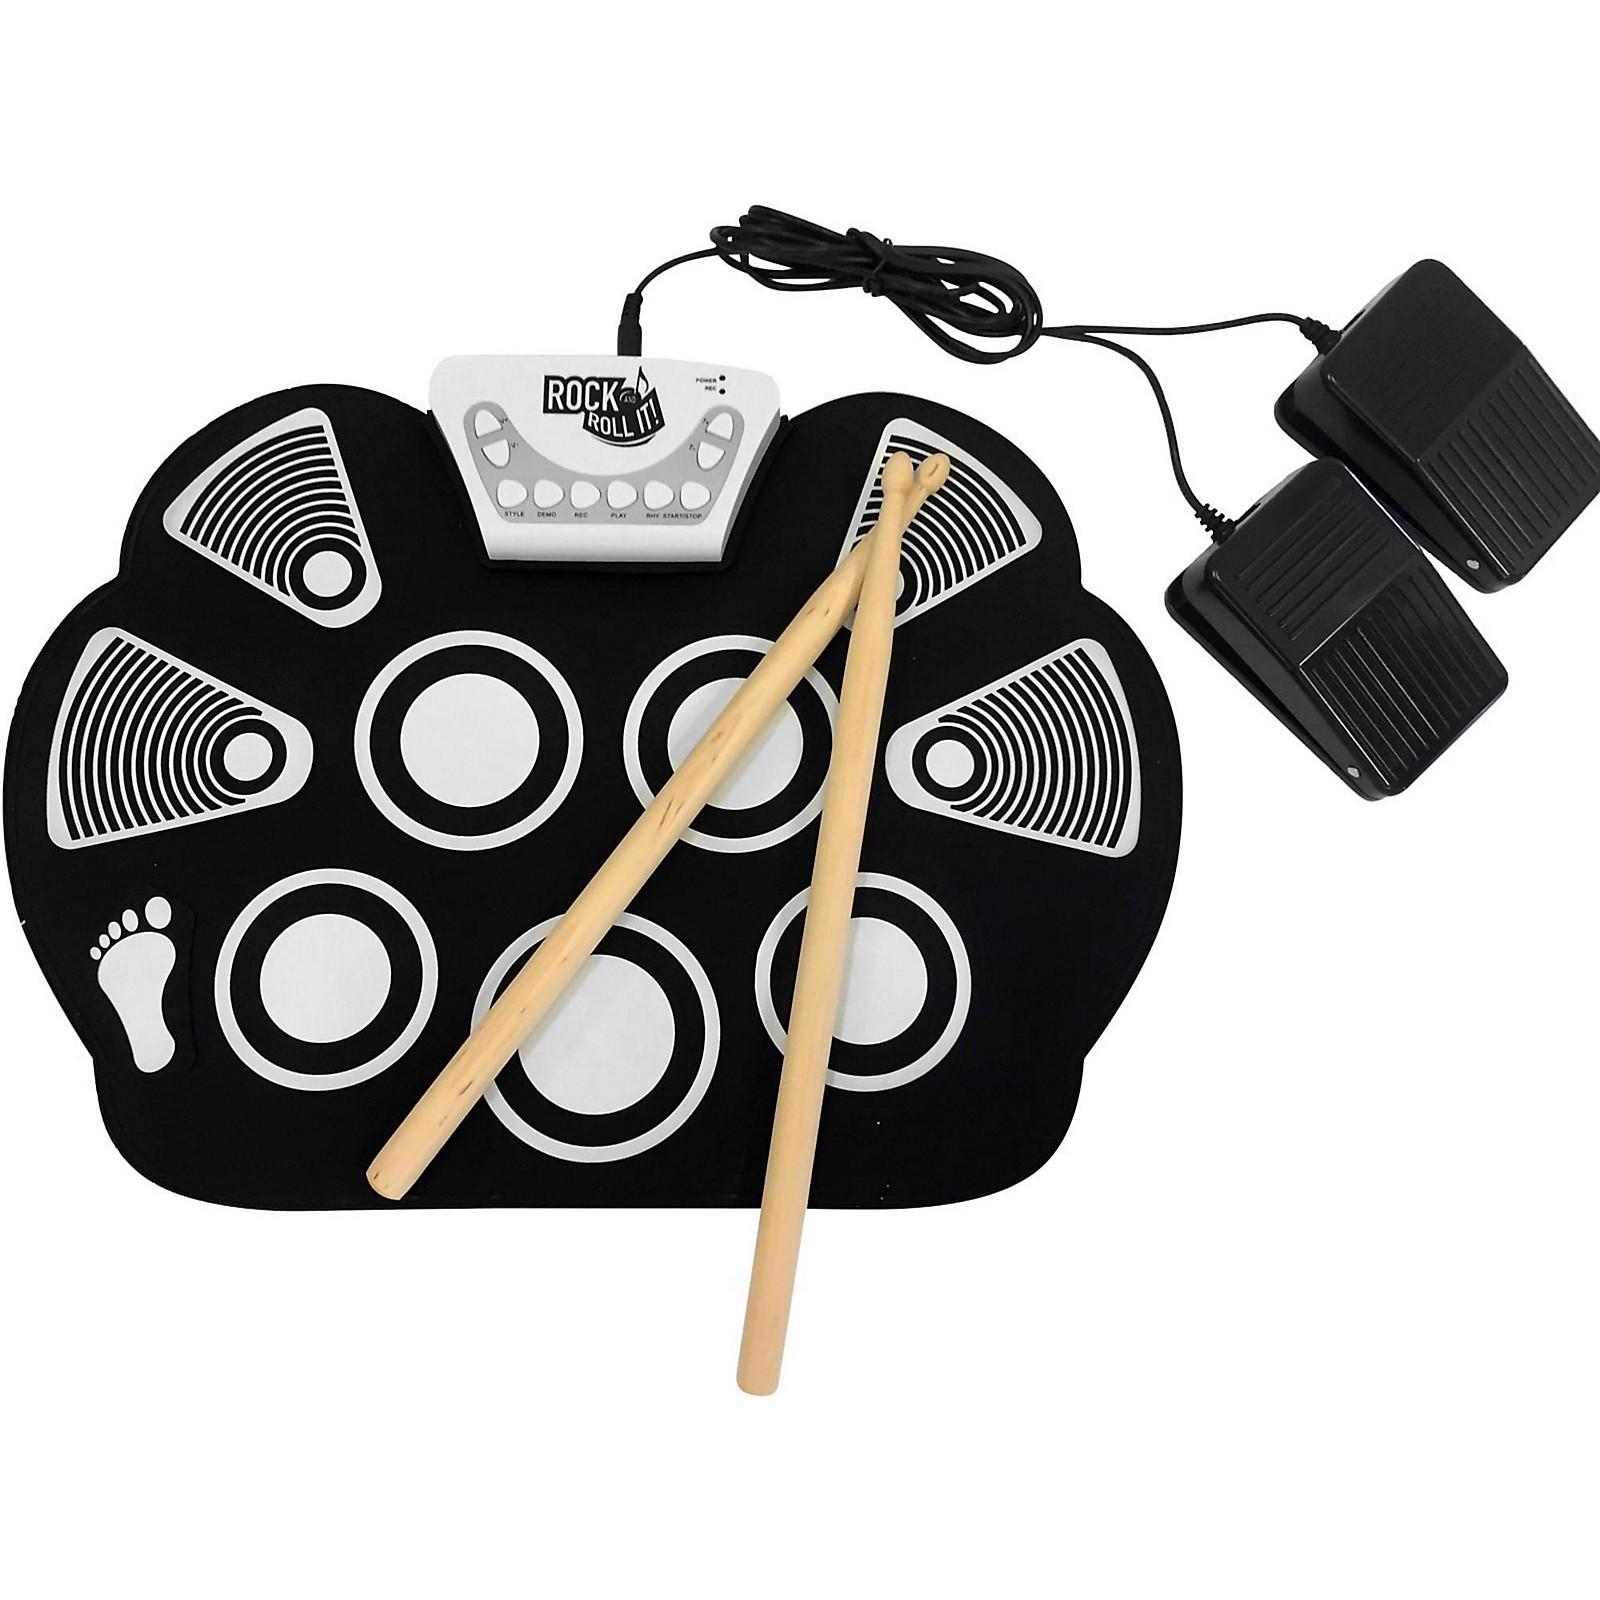 MukikiM Rock And Roll It - Drum